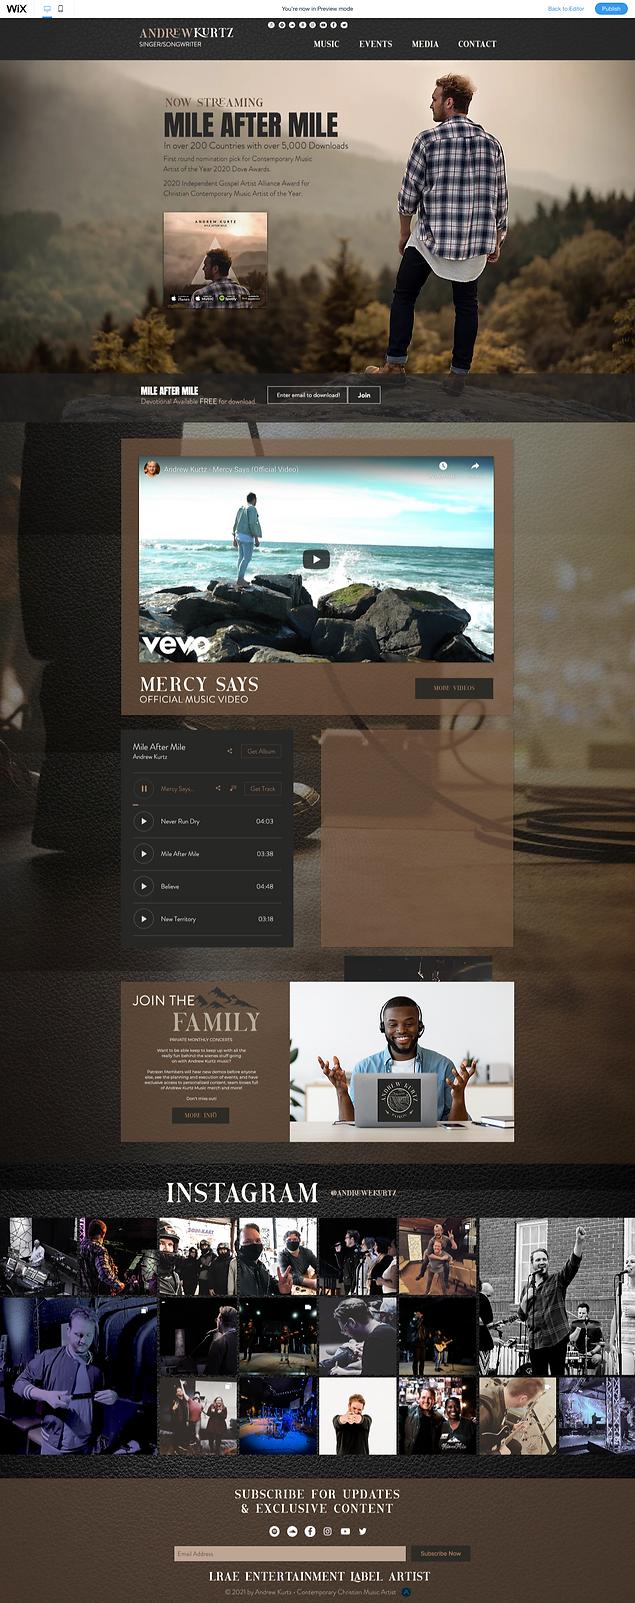 Andrew Kurtz Website Rebrand